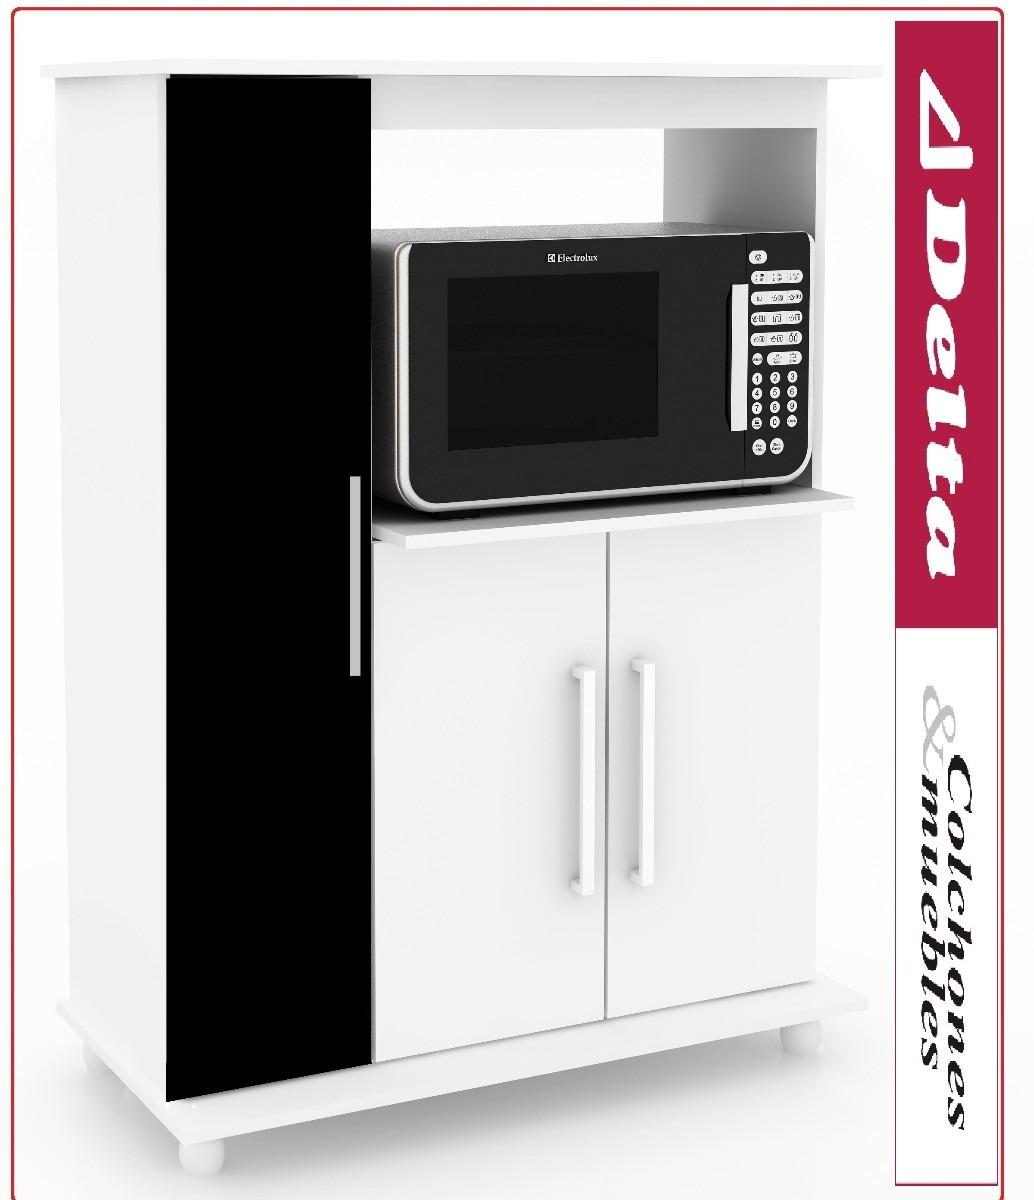 Mueble Para Microondas Alacena Kit De Cocina Equipamiento  $ 2390,00